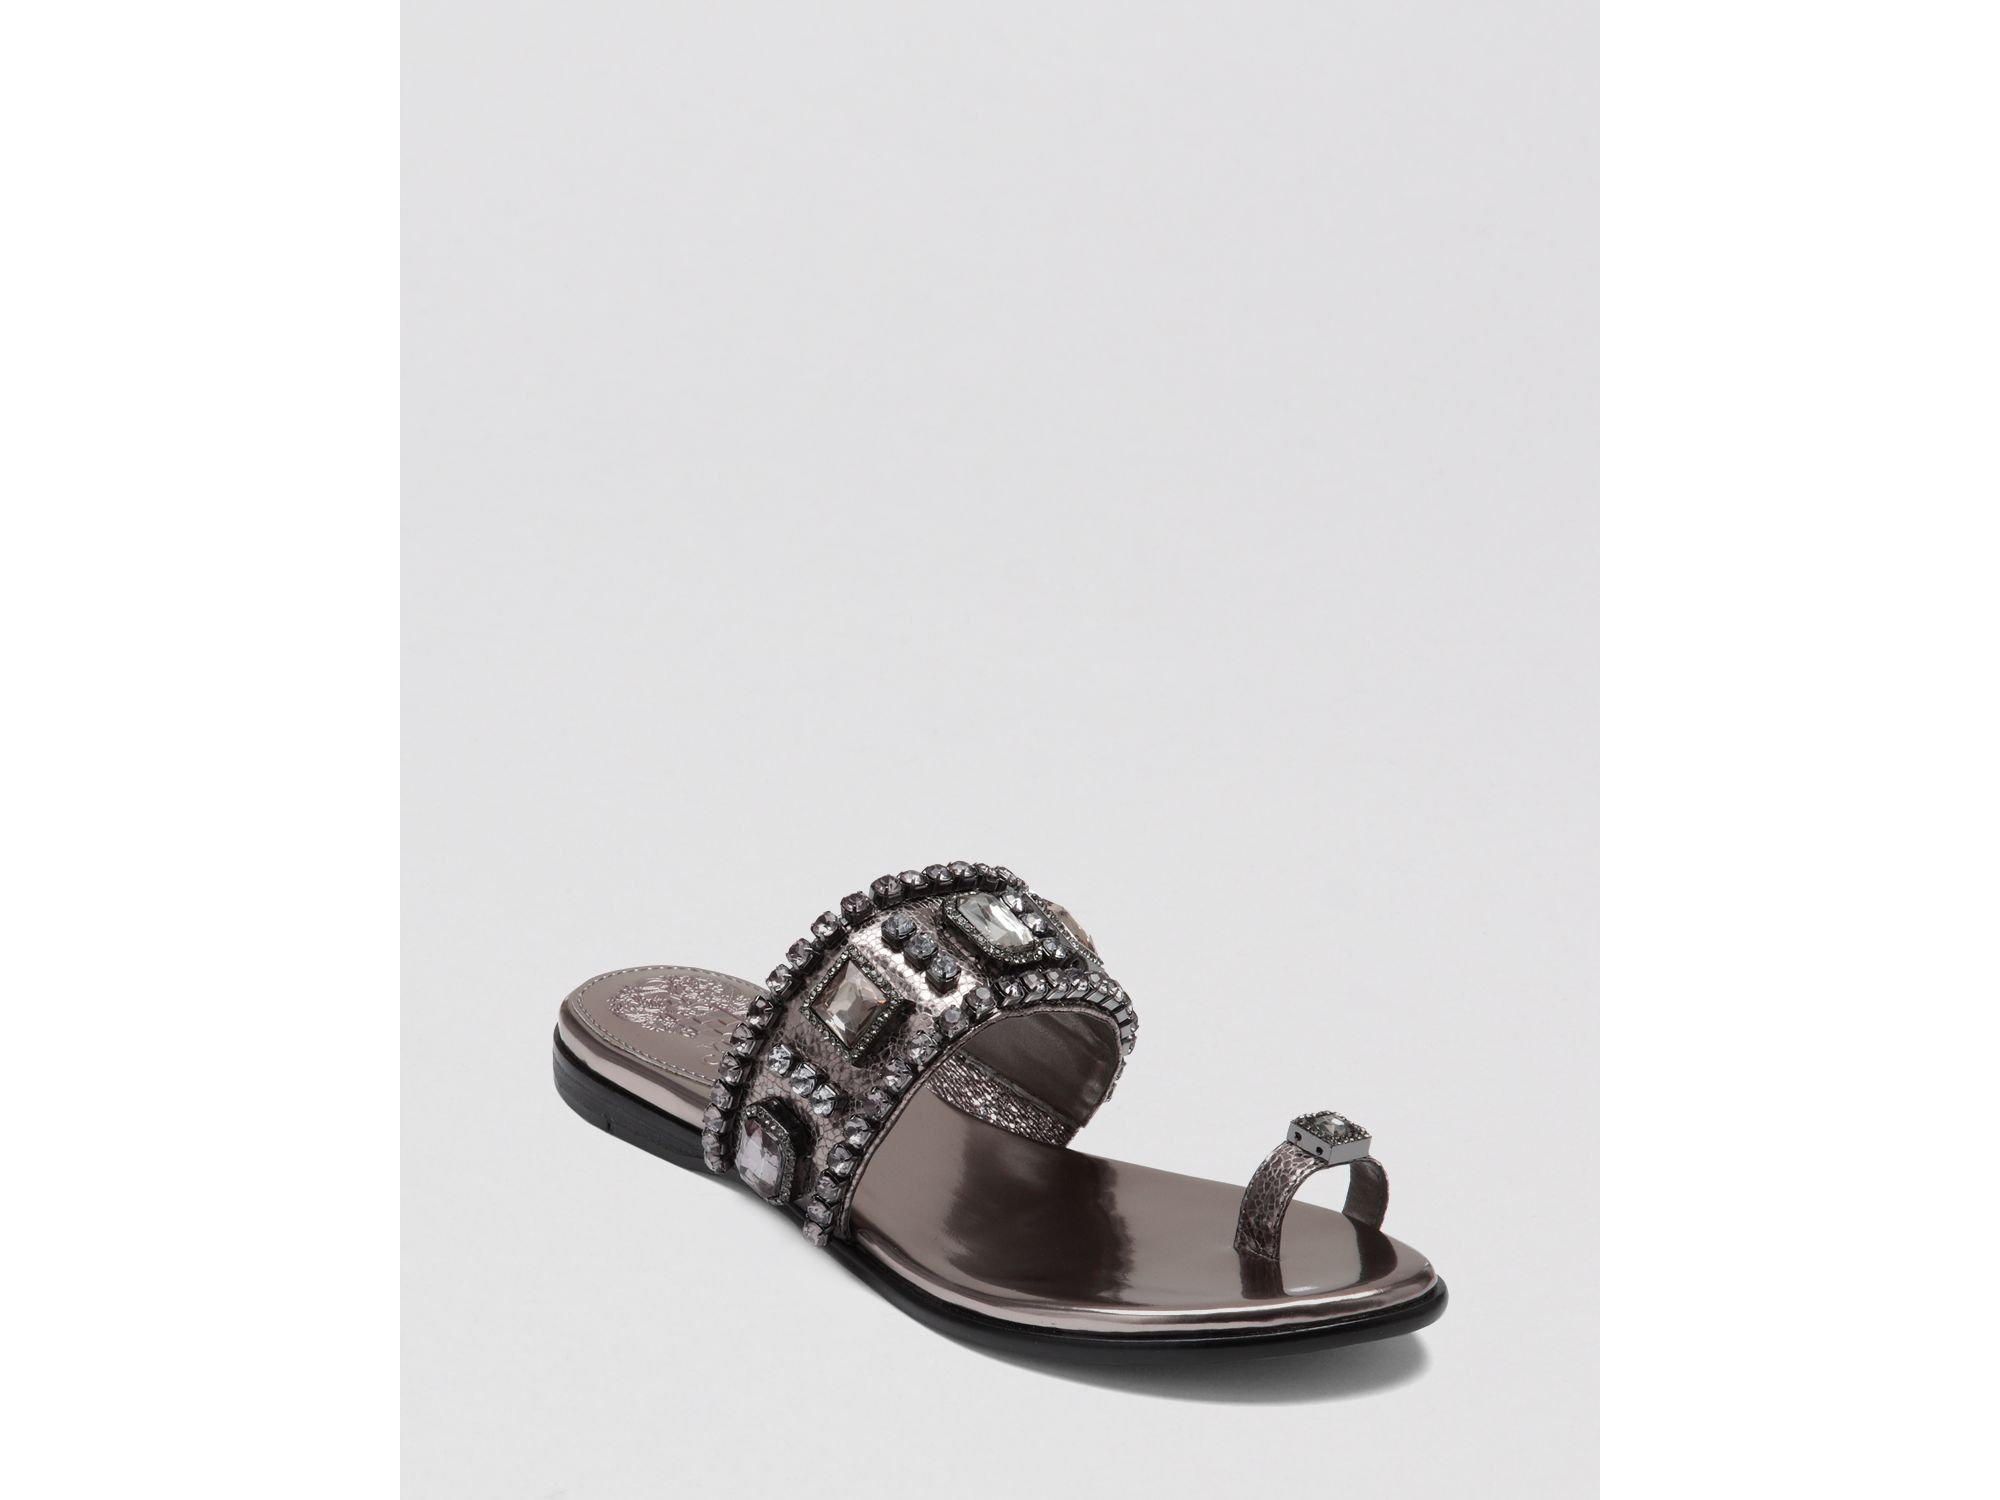 Vince Camuto Rhinestone Ring Sandals